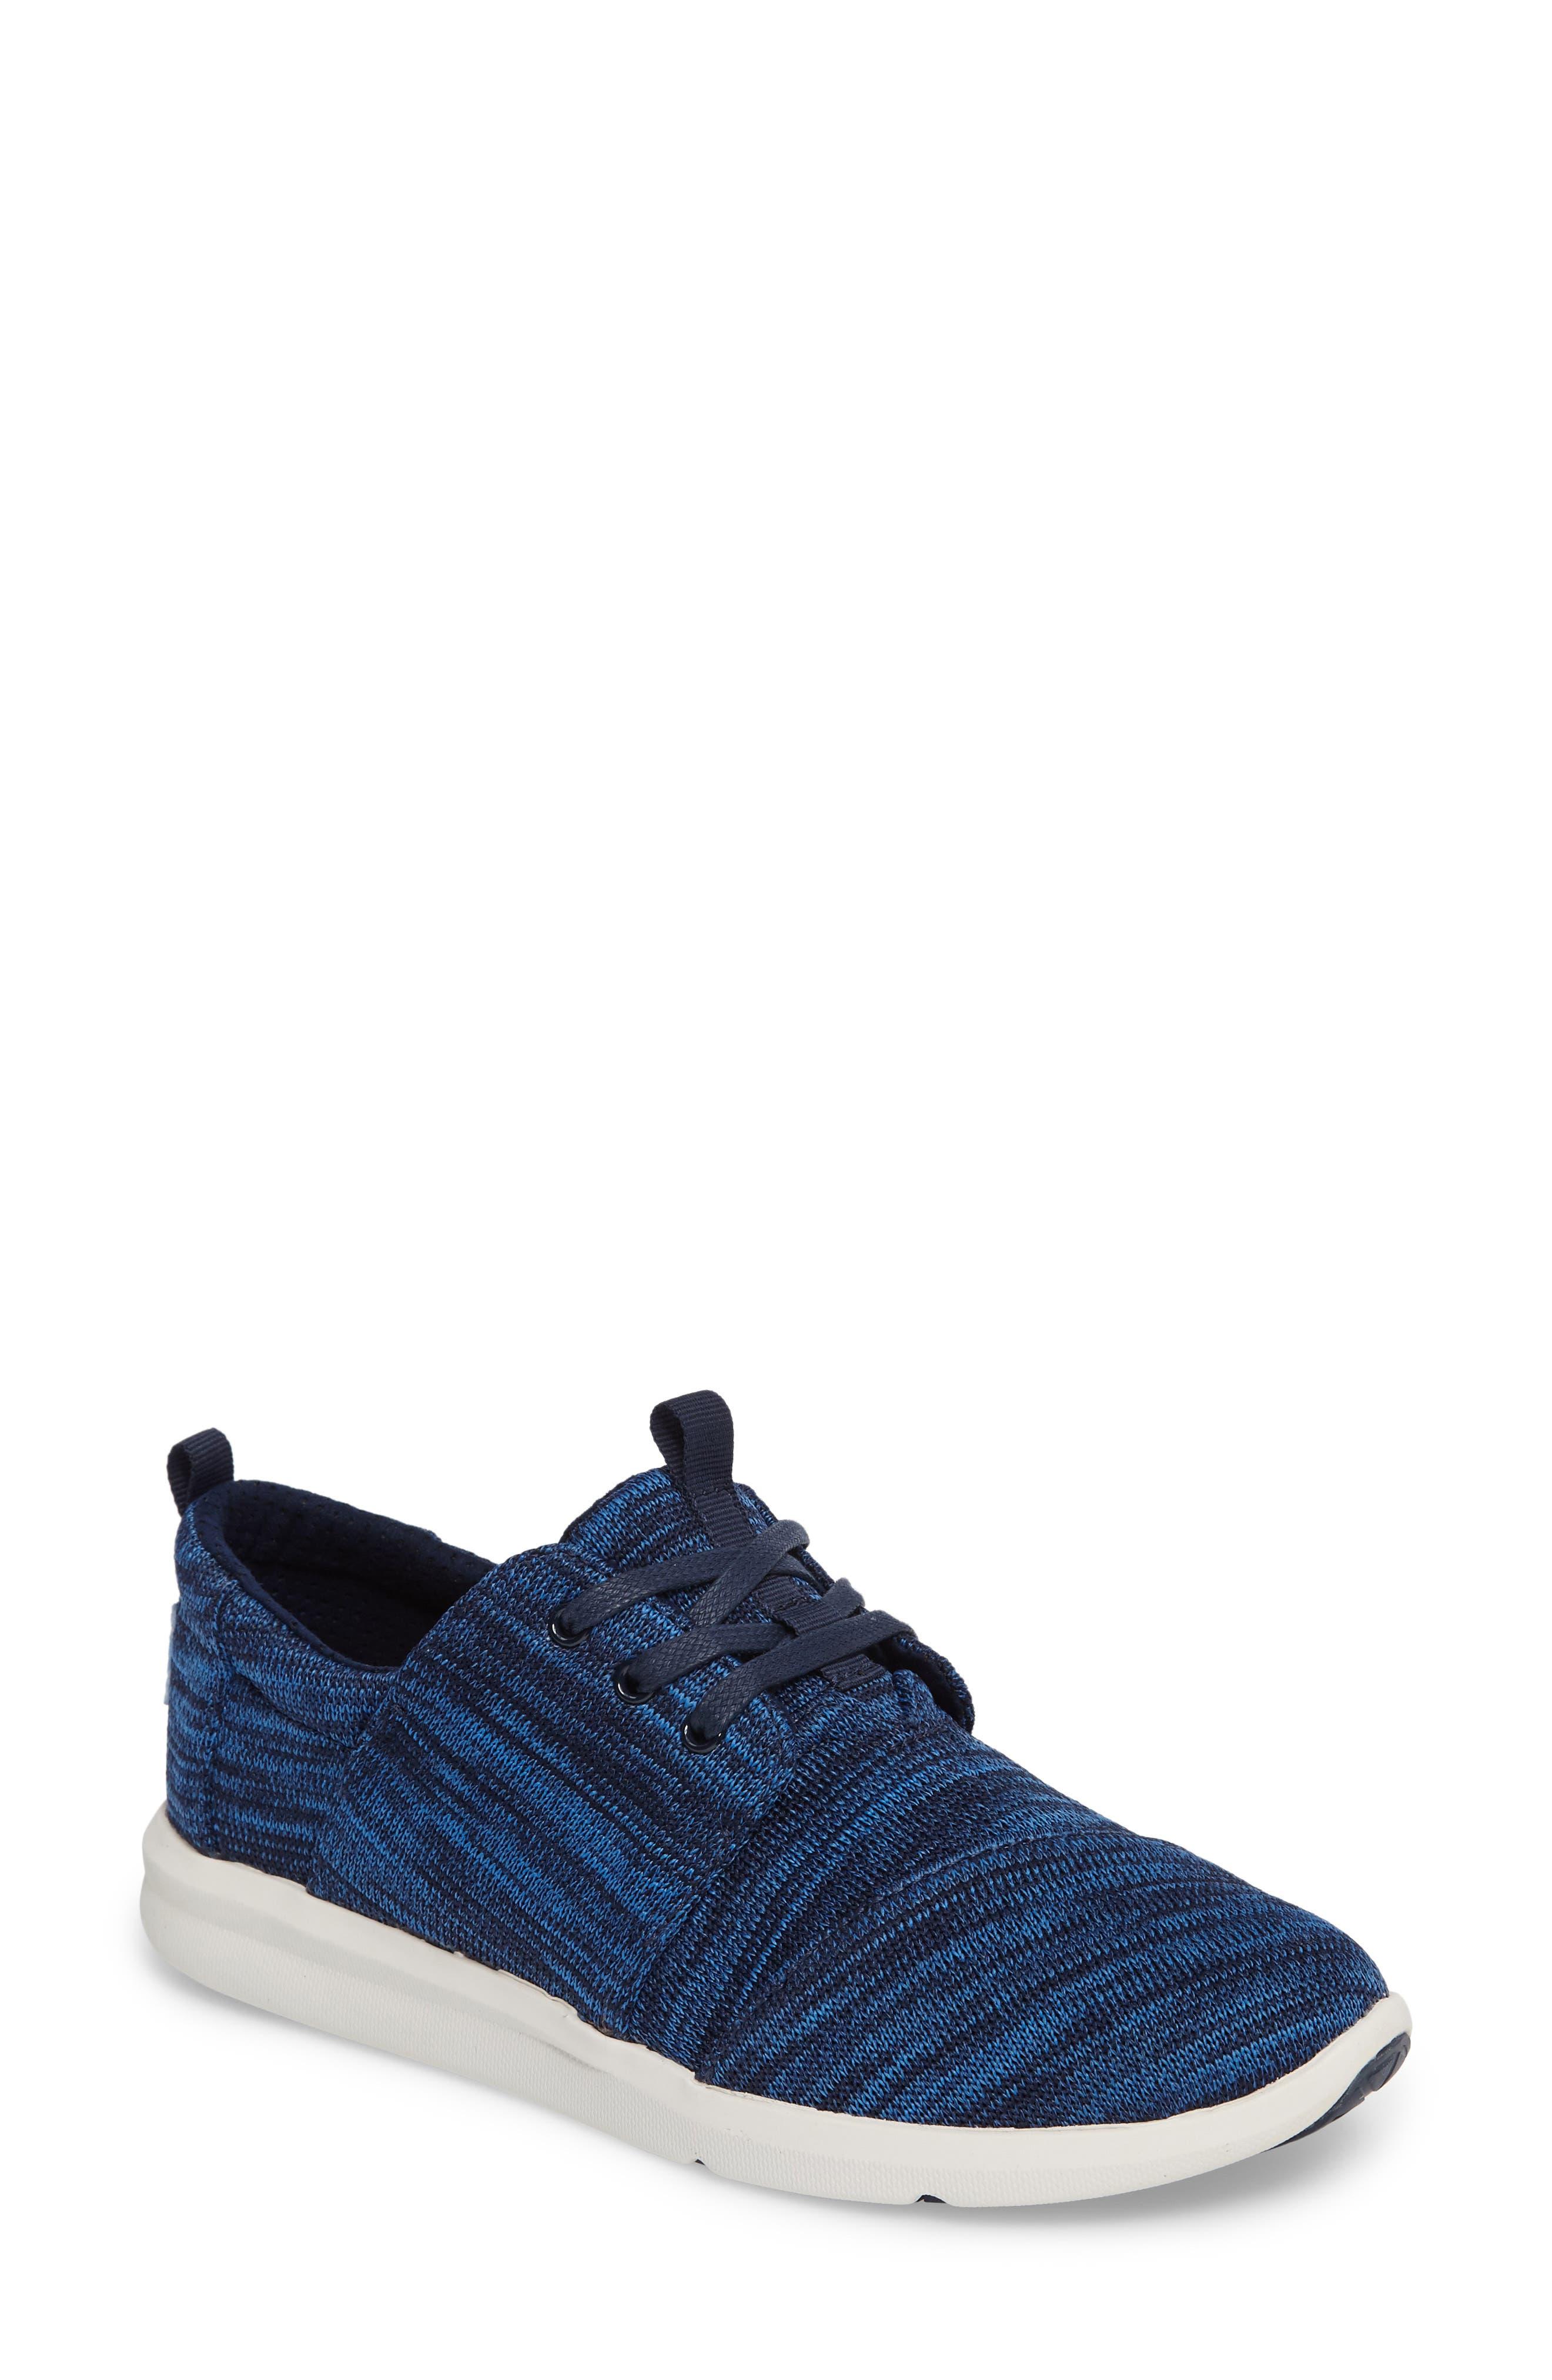 Alternate Image 1 Selected - TOMS 'Del Ray' Sneaker (Women)